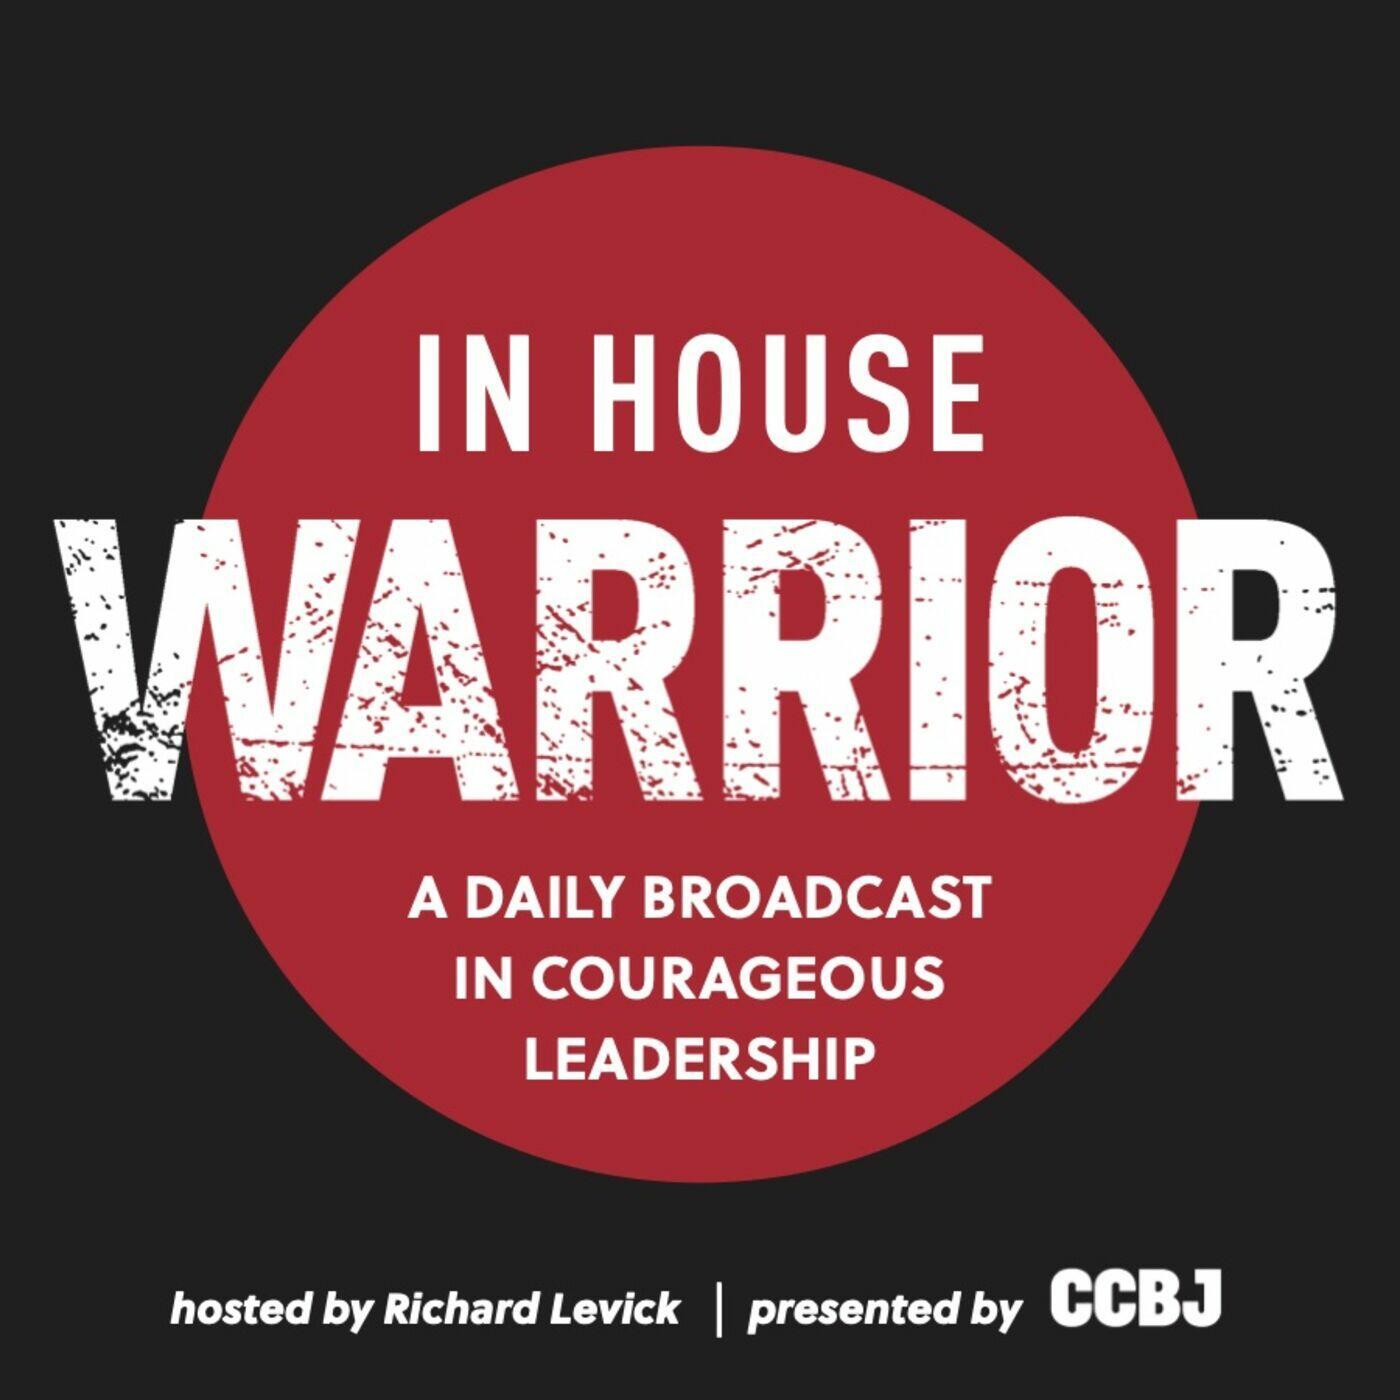 In House Warrior